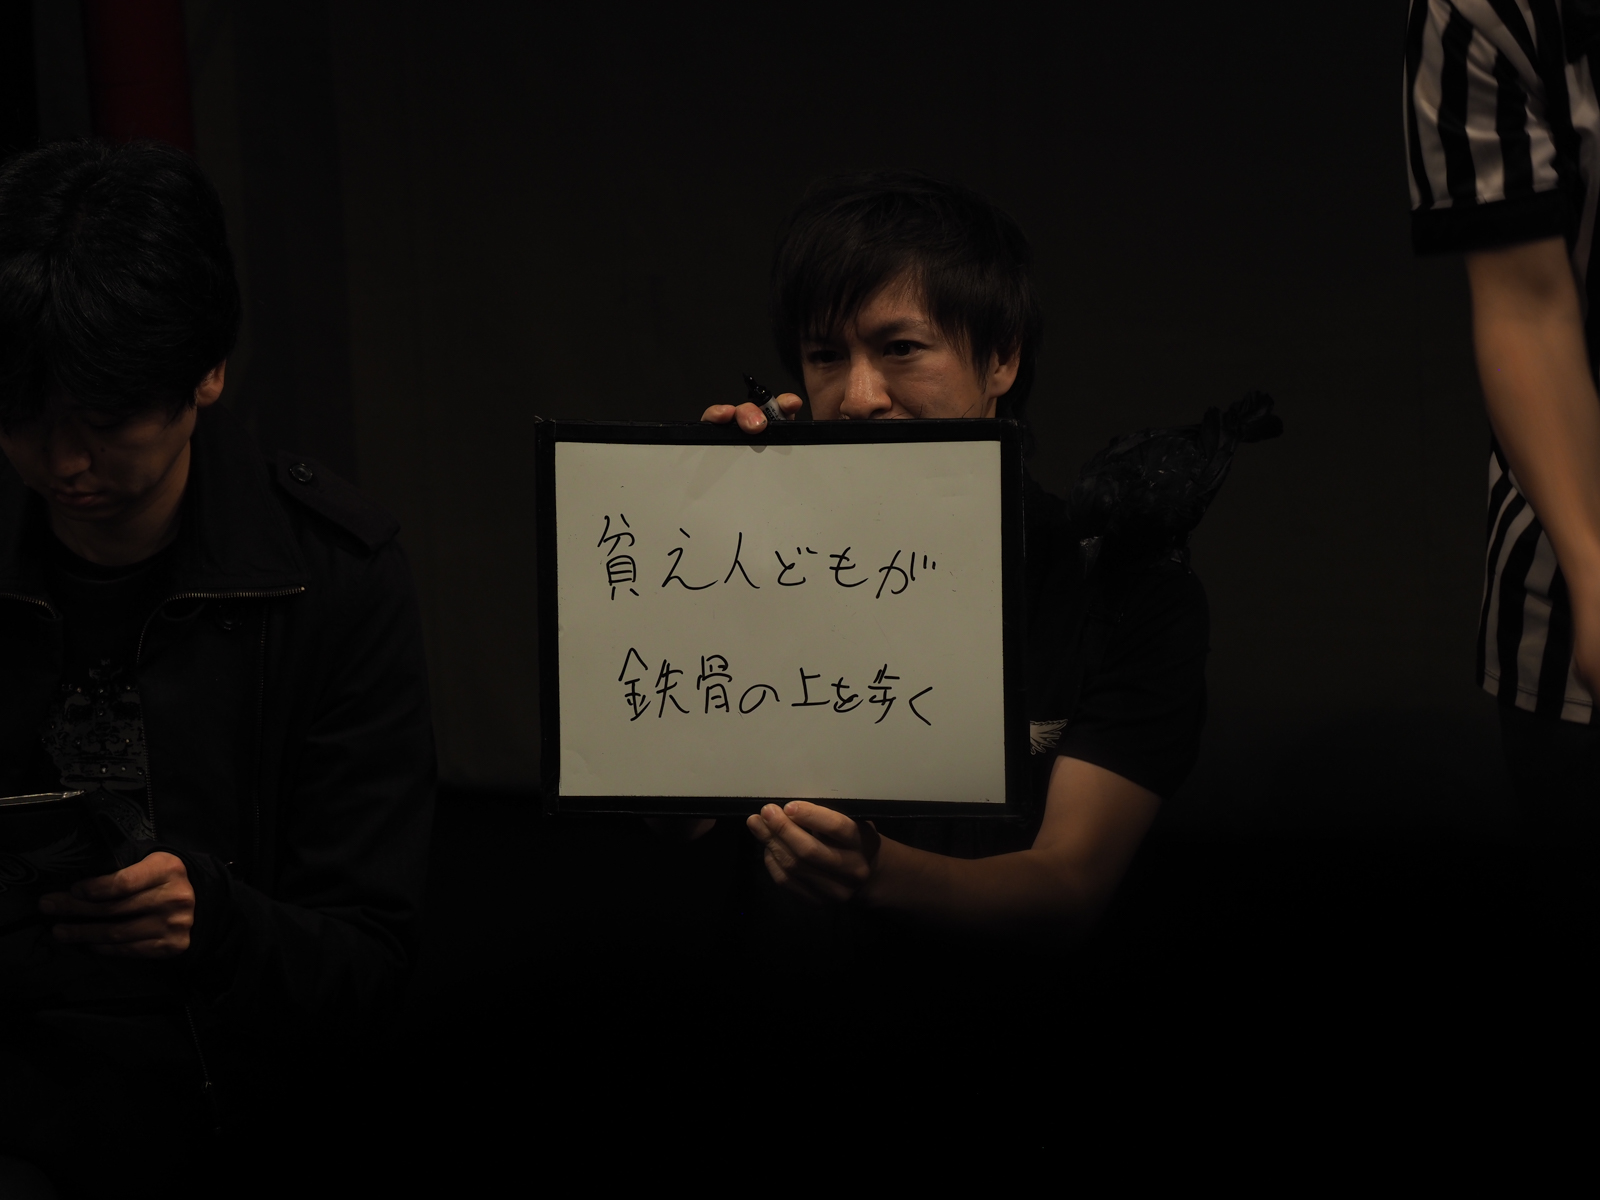 f:id:motomachi24:20171103202847j:plain